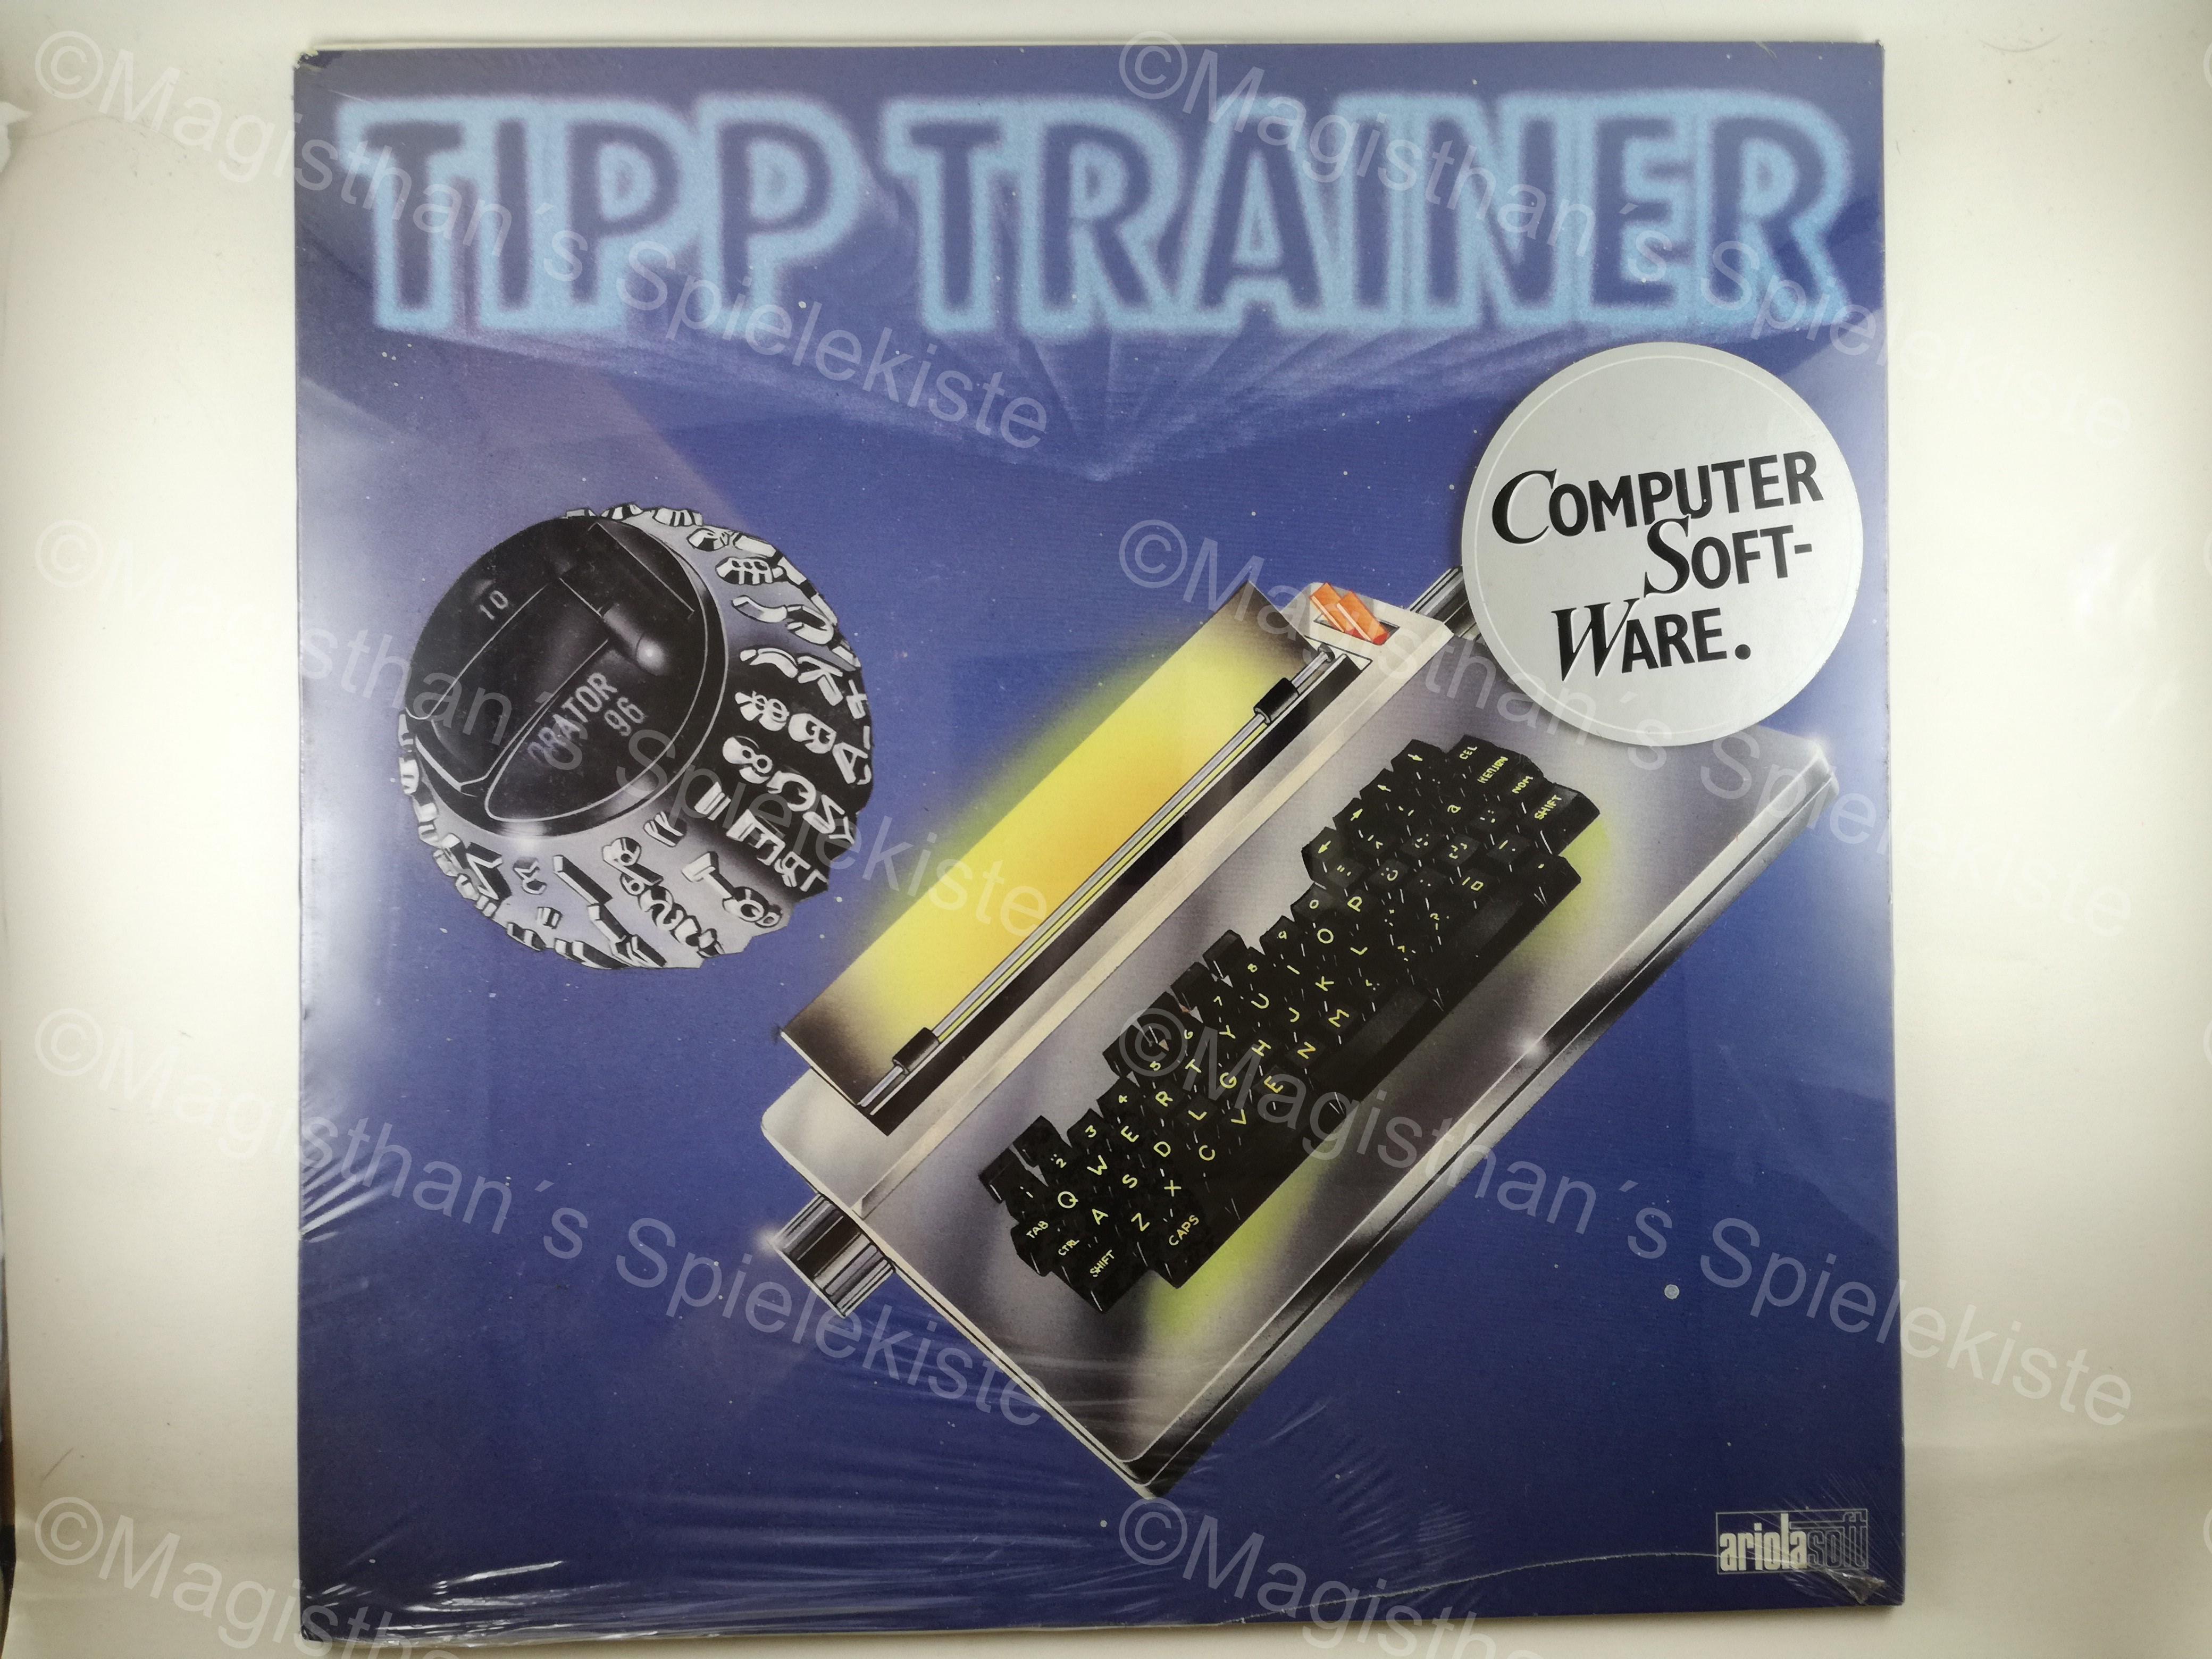 TippTrainerAtari1.jpg